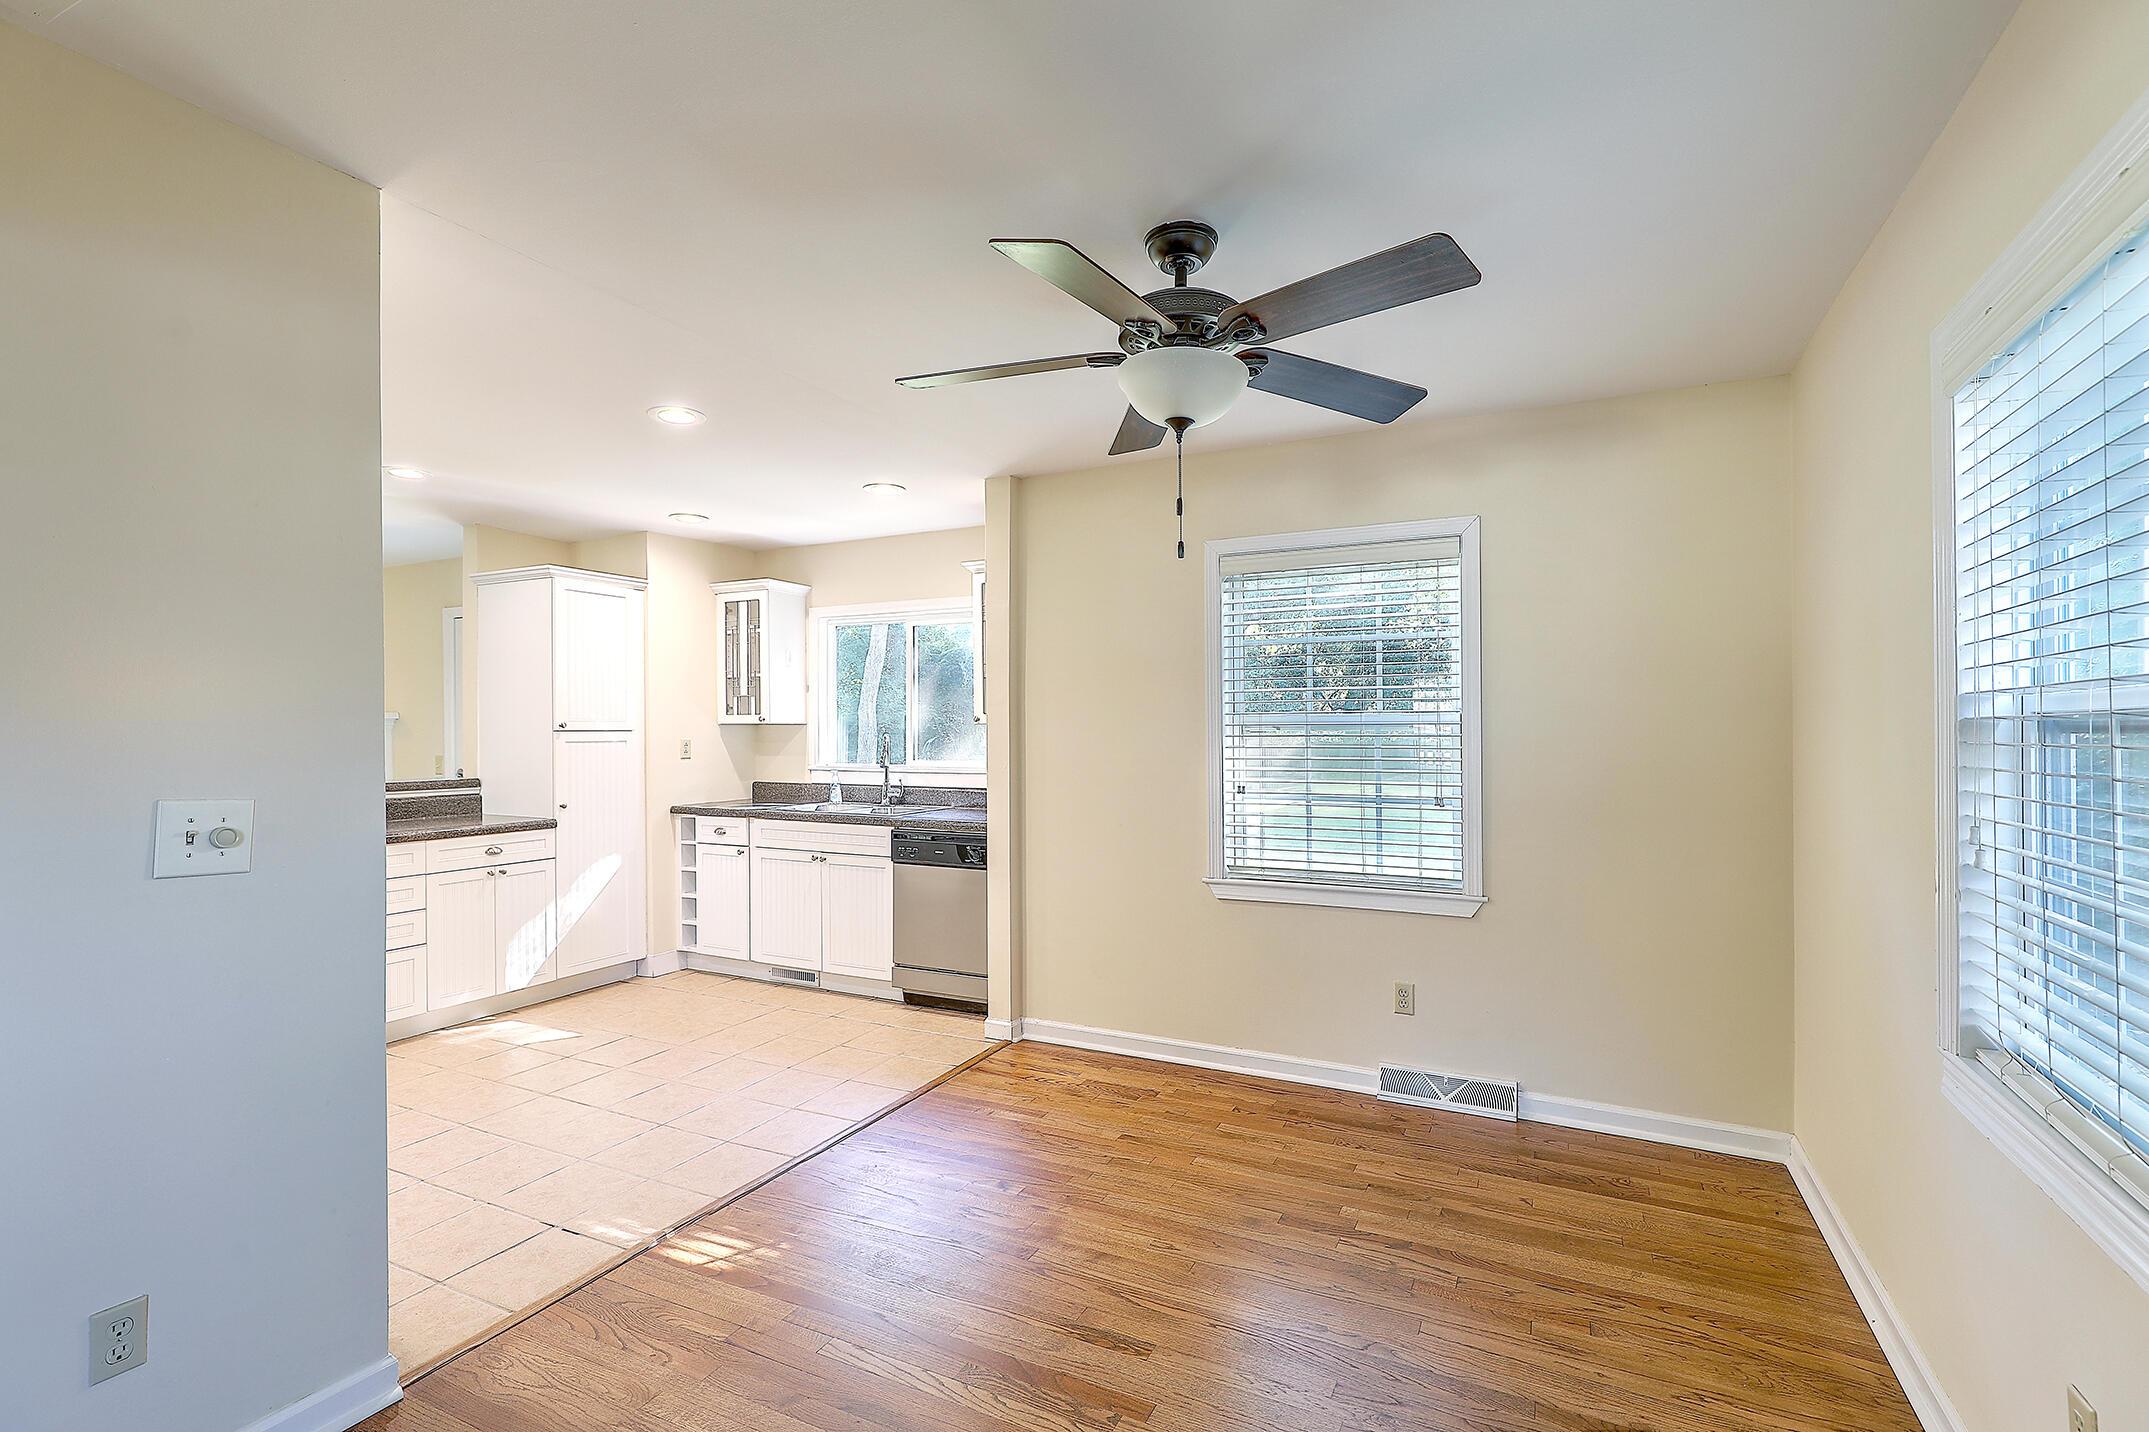 Cooper Estates Homes For Sale - 901 Searle, Mount Pleasant, SC - 14